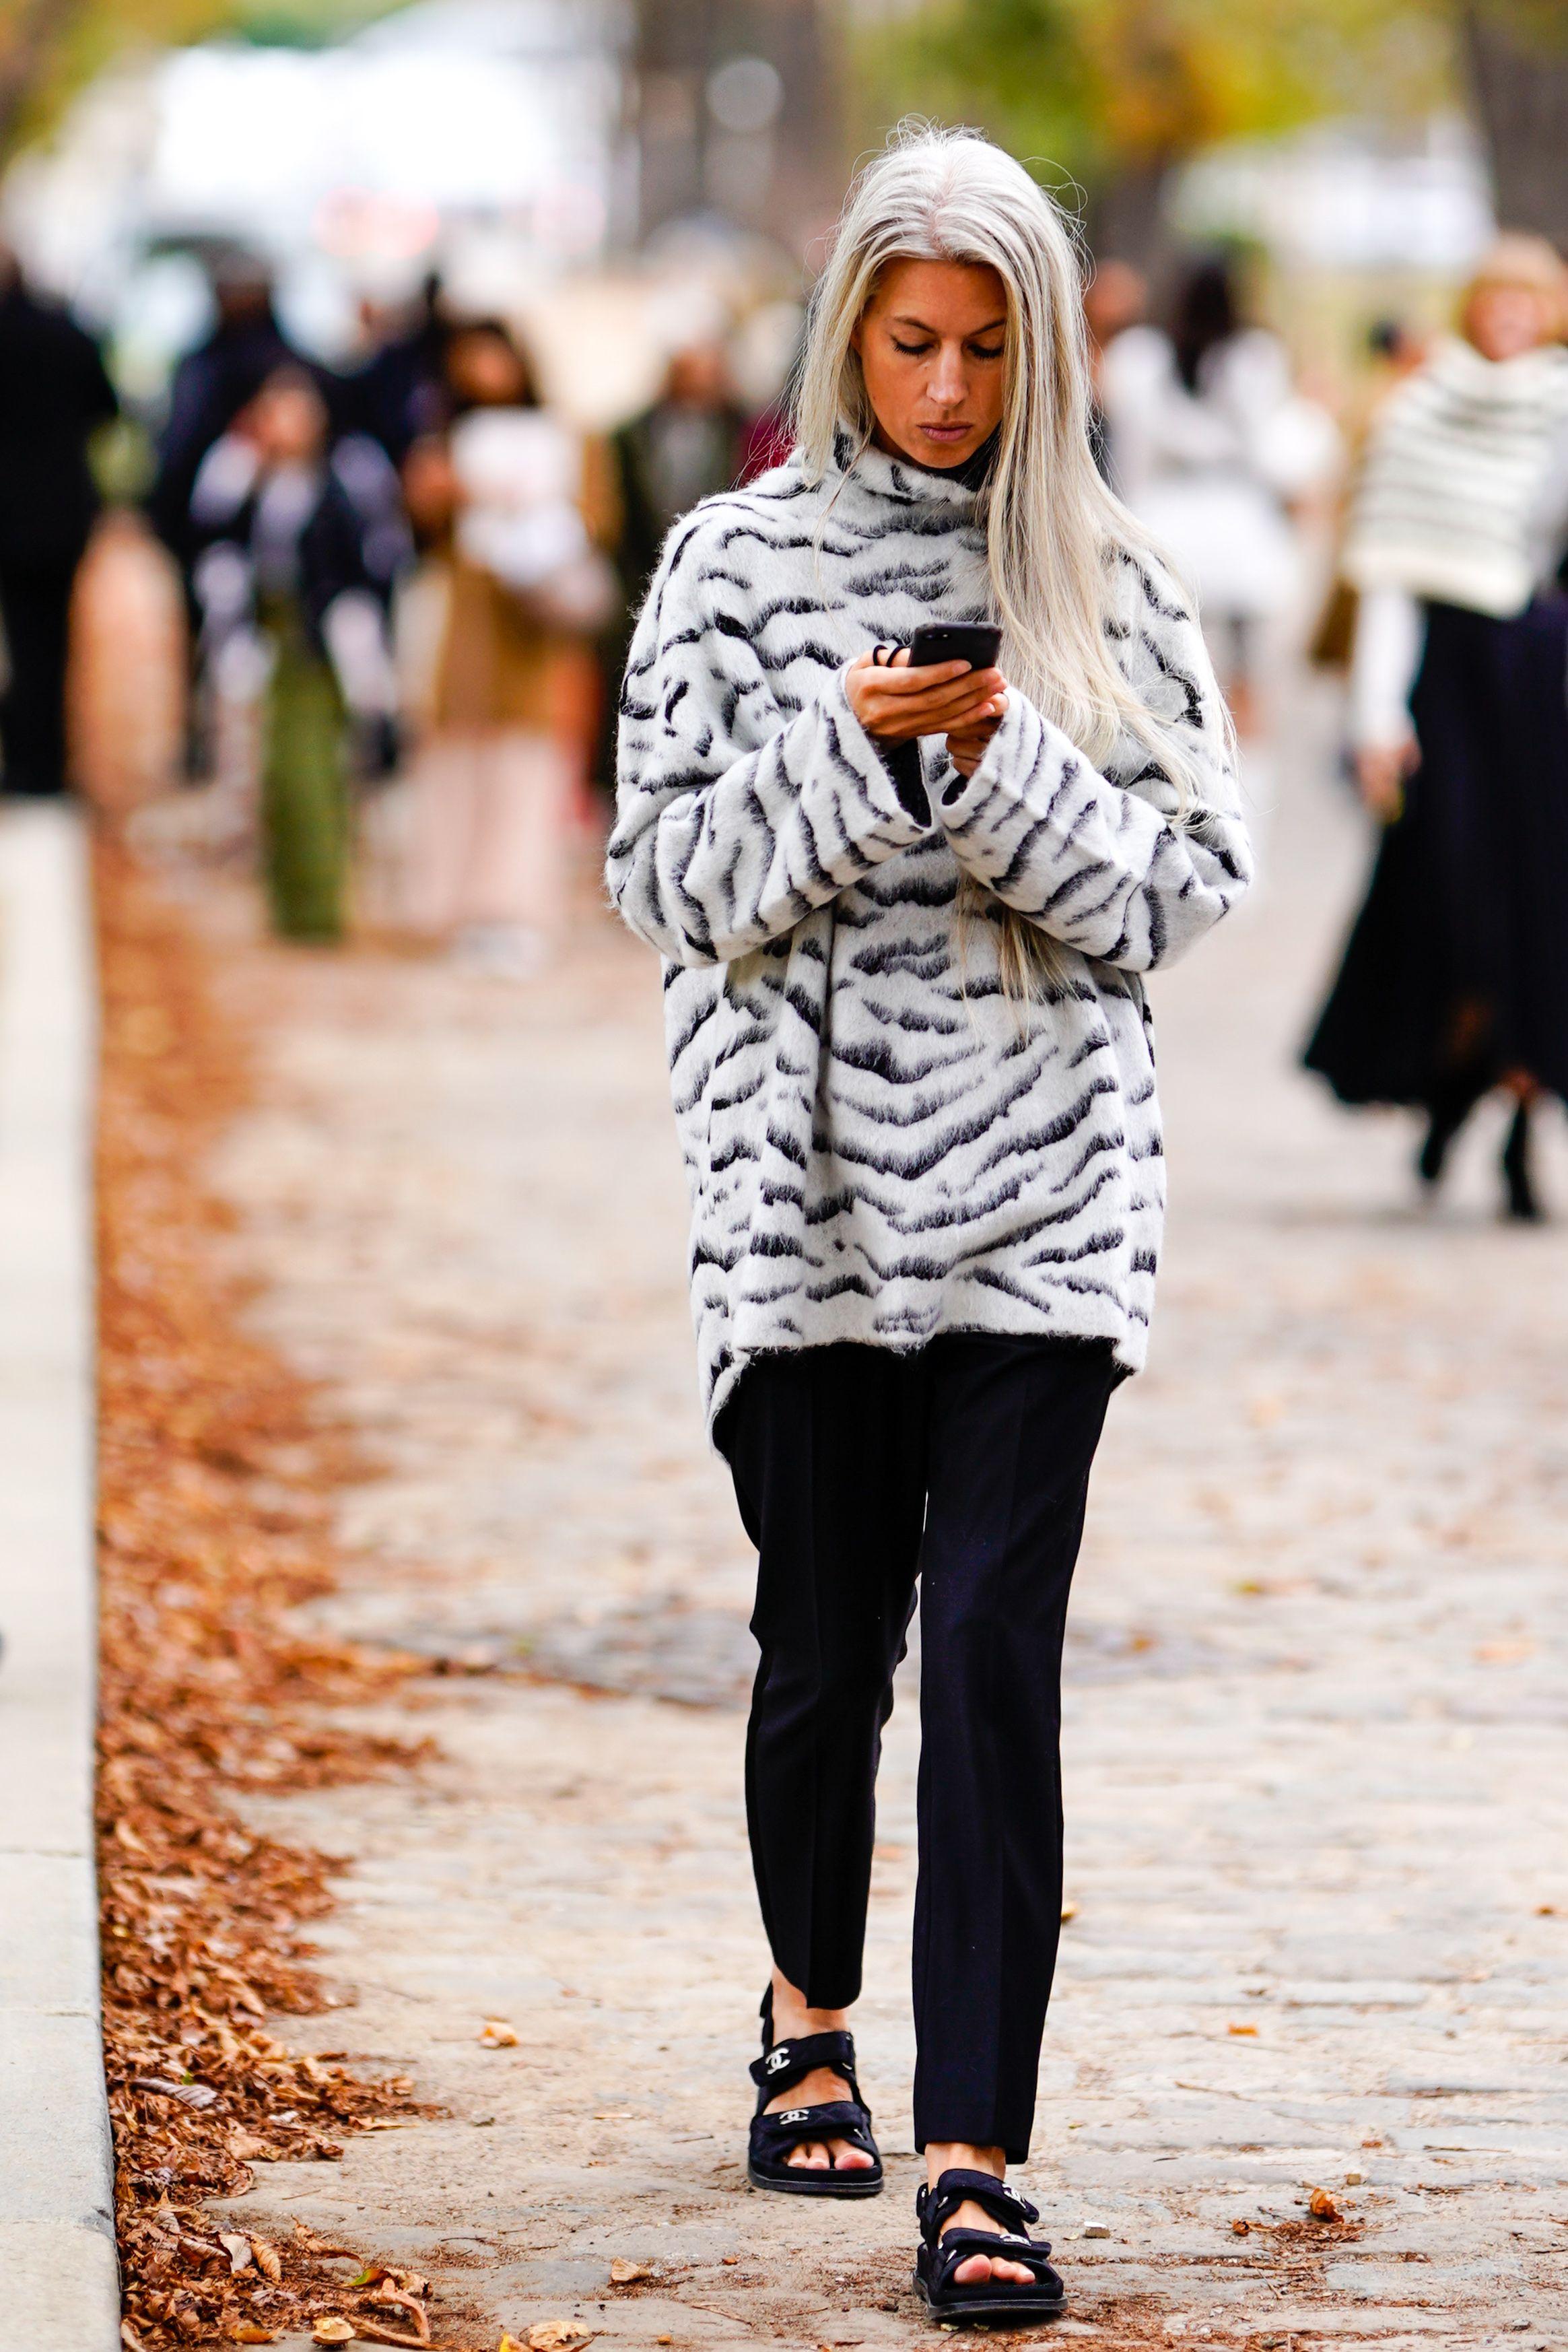 sarah-harris-black-white-tiger-print-sweater-1541011795.jpg (2329×3493)